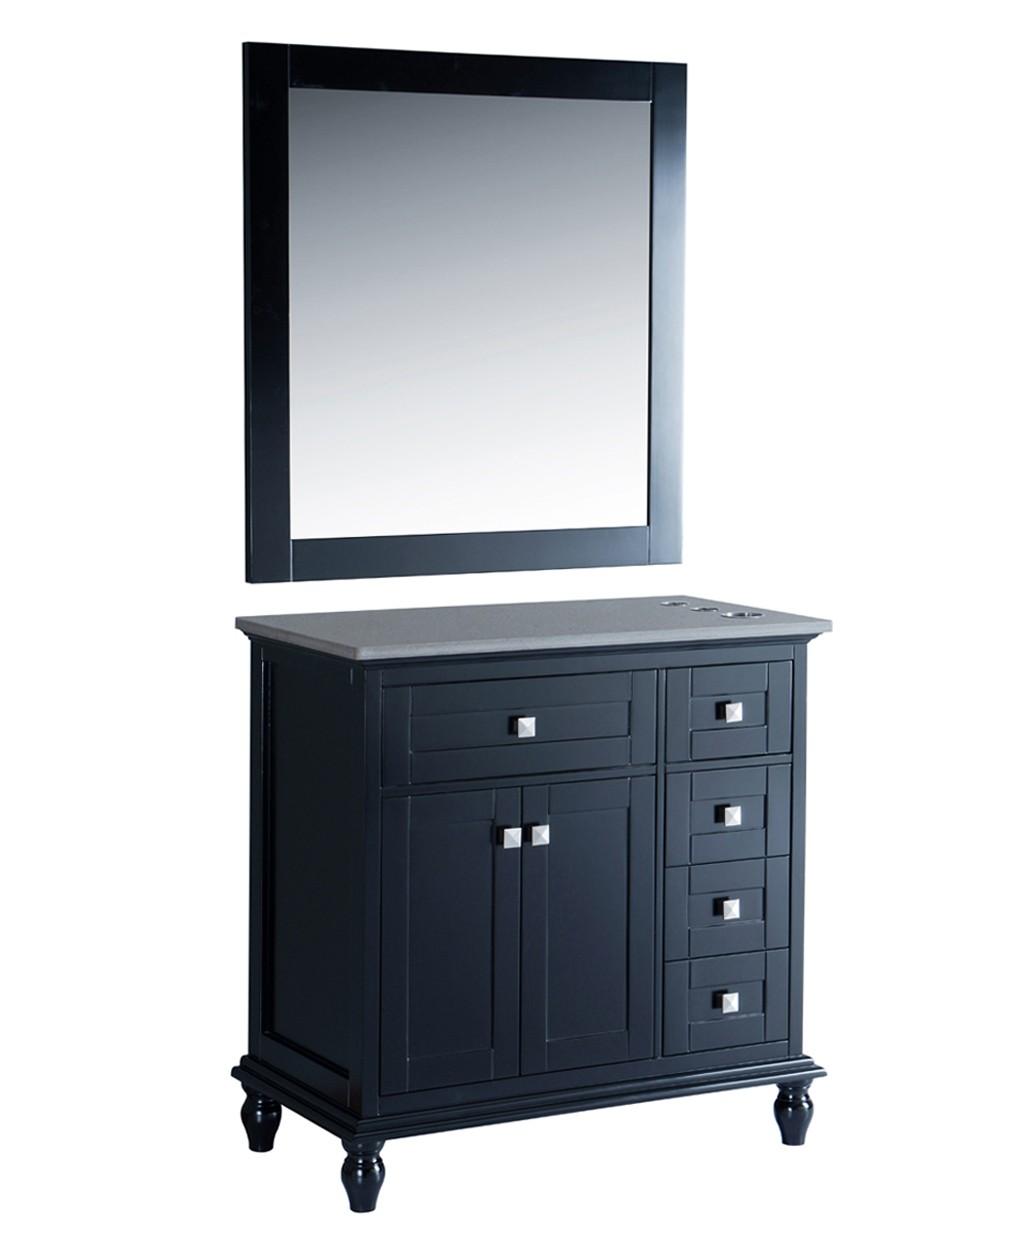 "Madison 42"" Black Vanity Styling Station & Mirror"